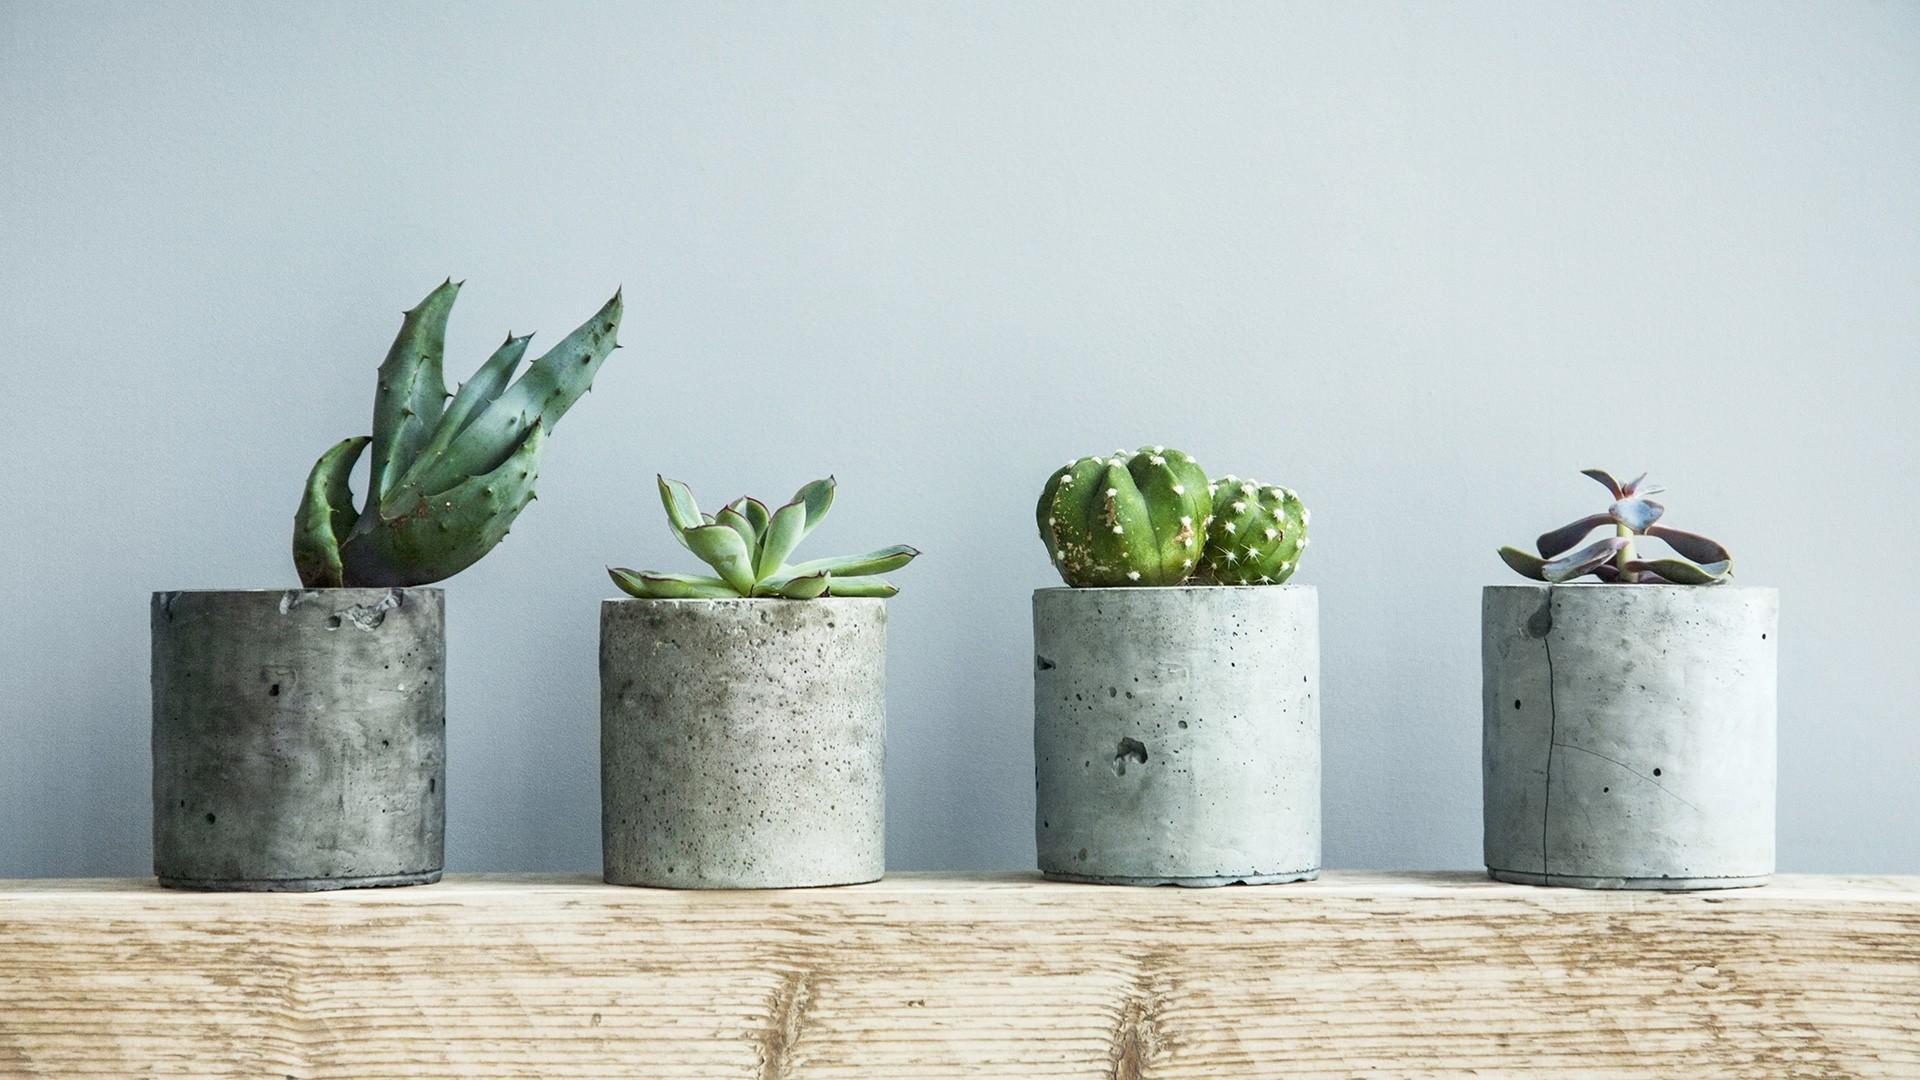 Cactus Minimalist wallpaper for computer